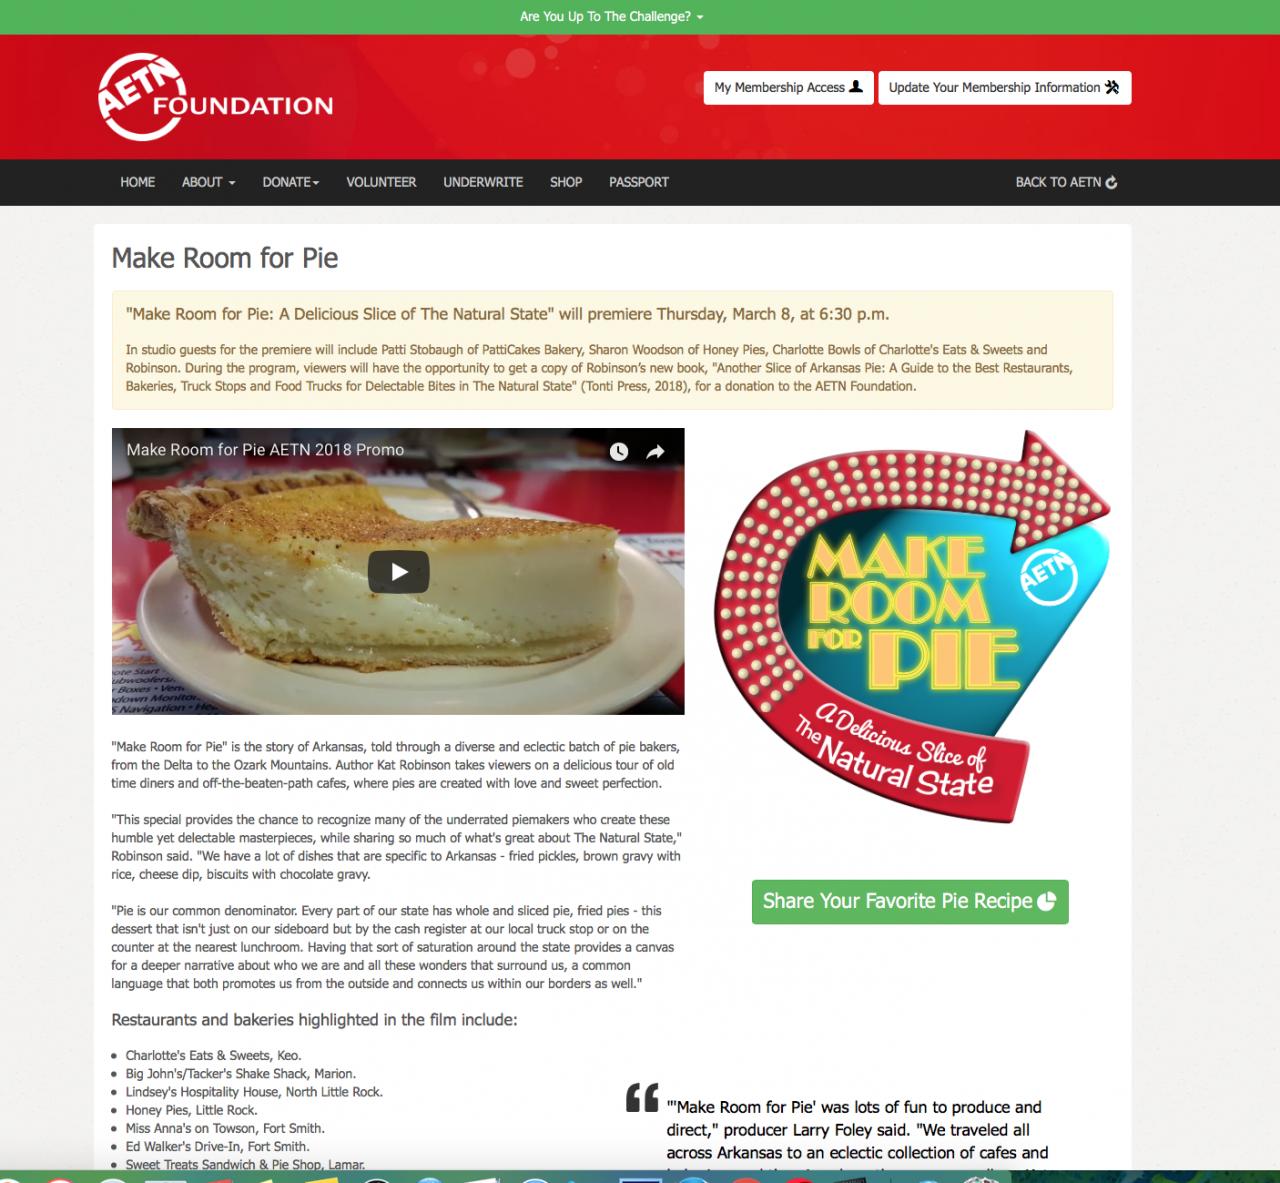 Make Room for Pie Website